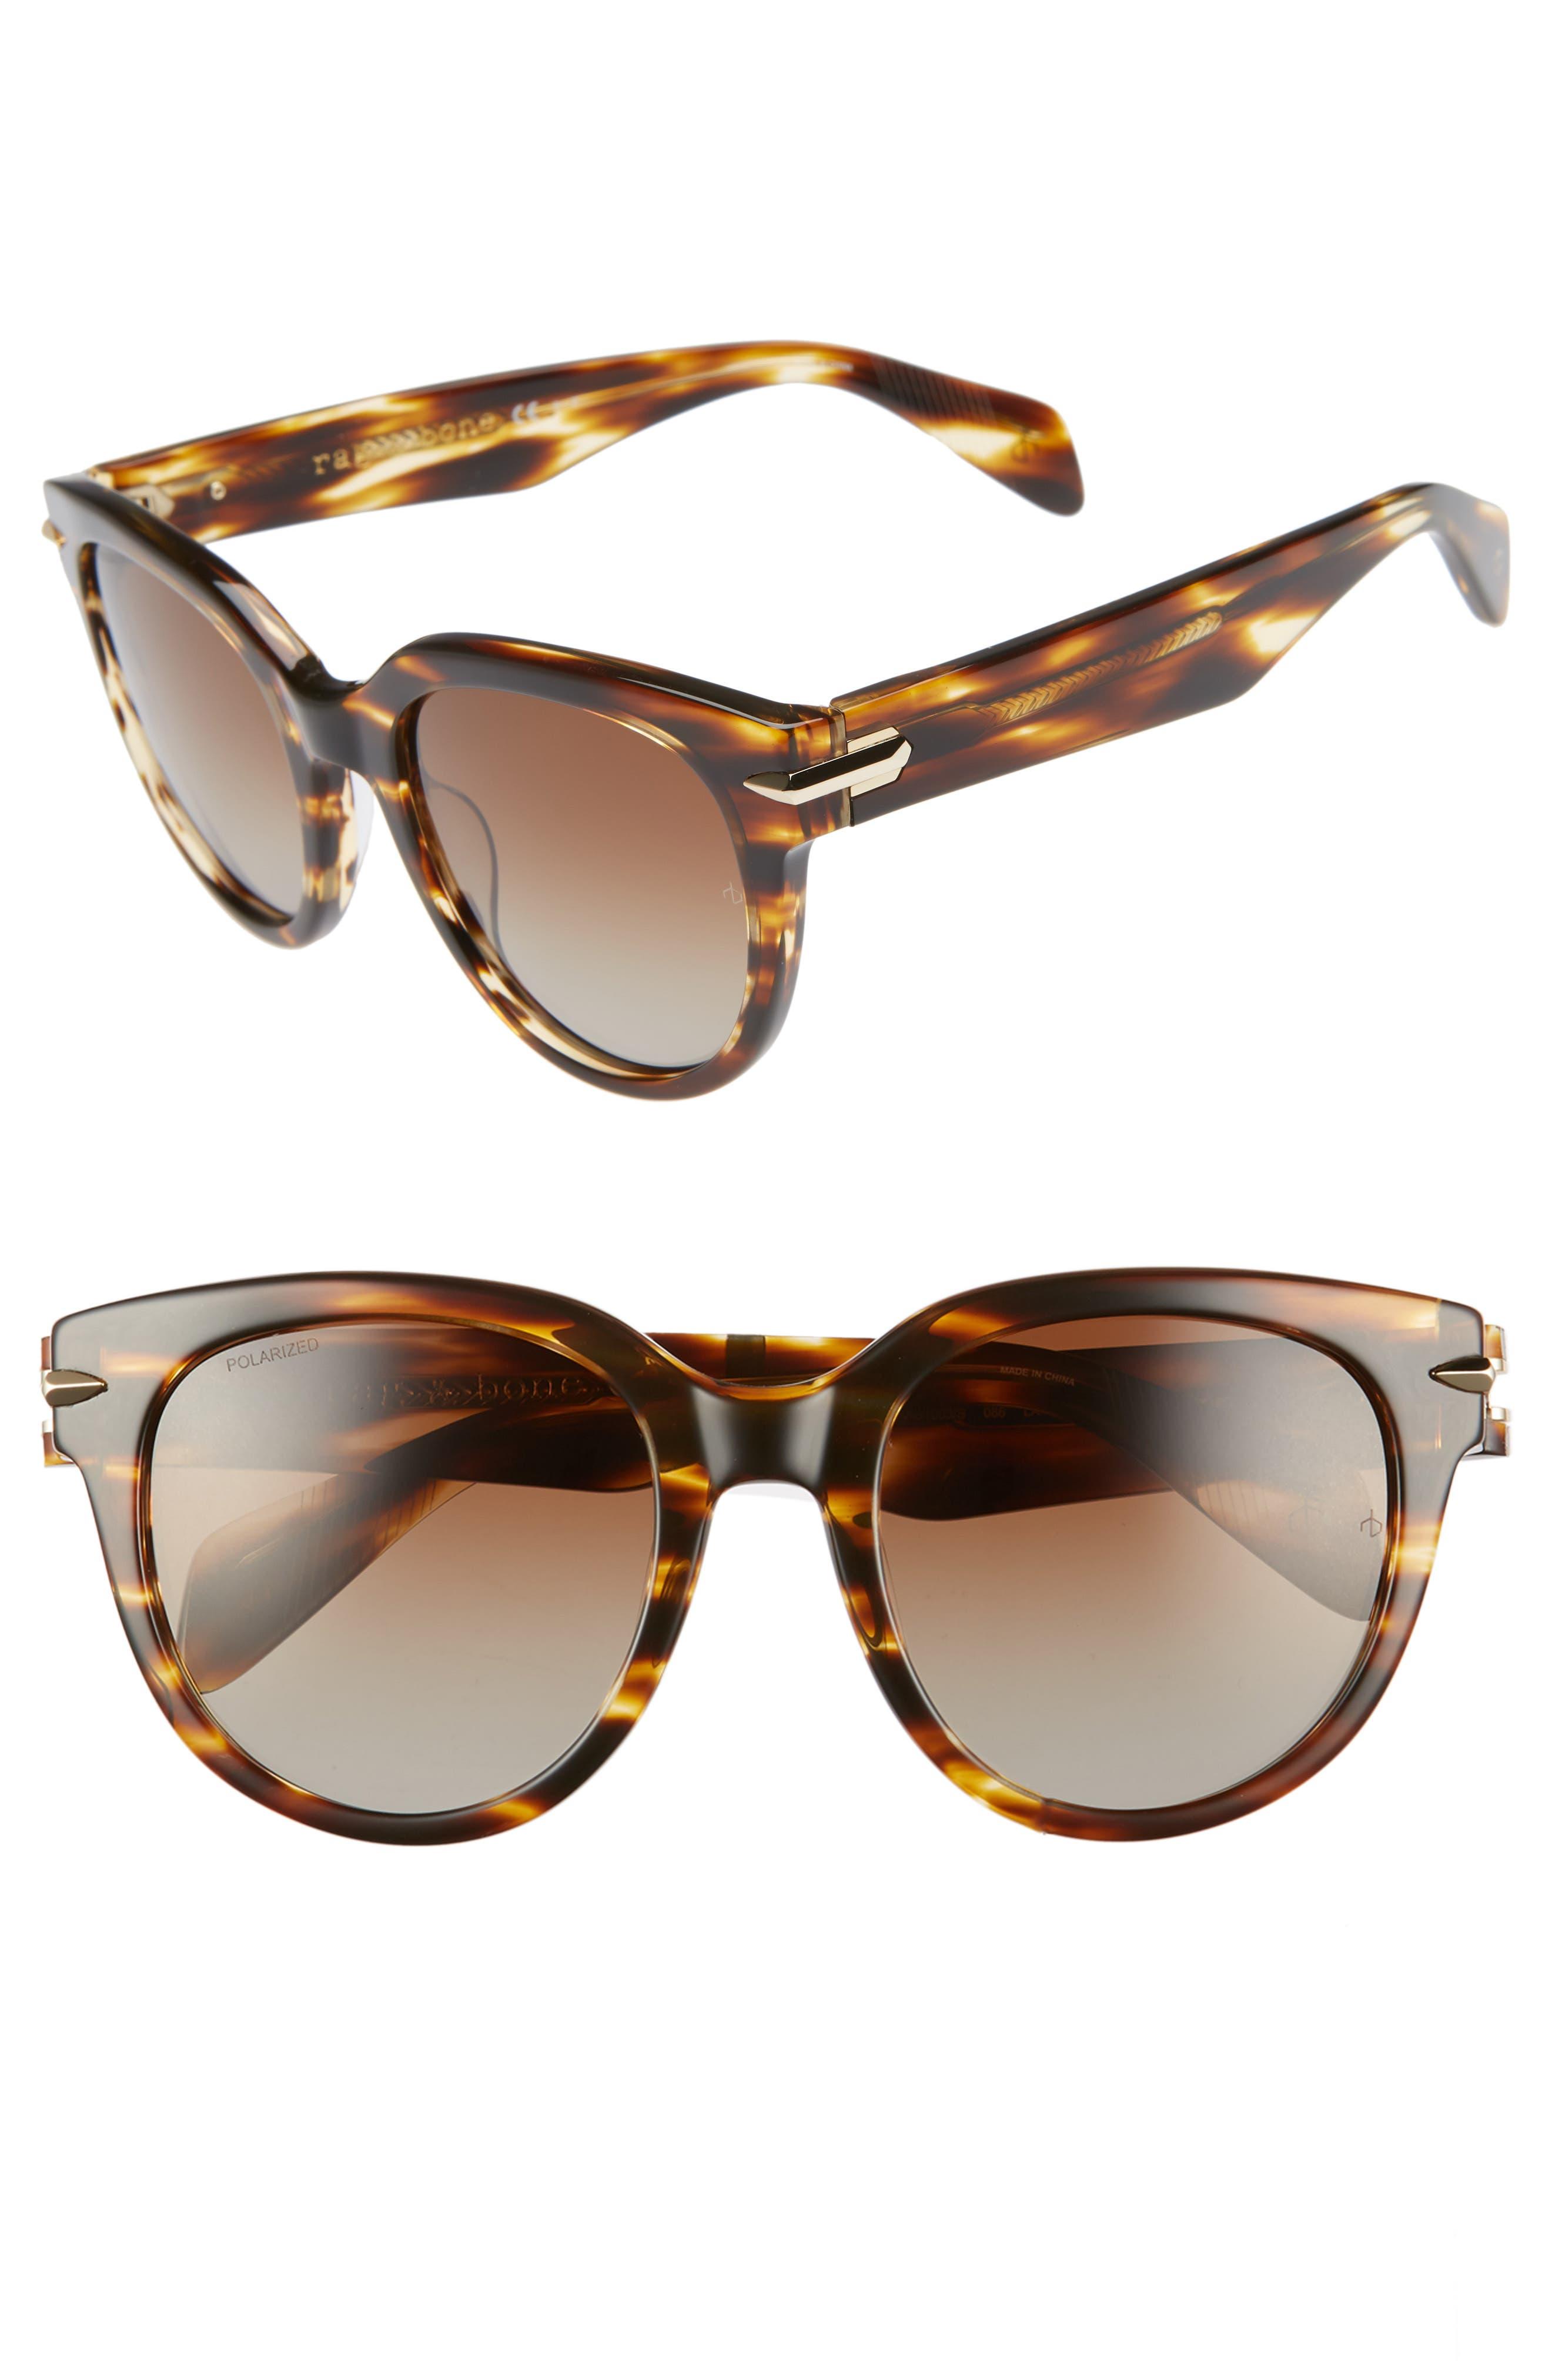 54mm Round Sunglasses,                             Main thumbnail 1, color,                             DARK HAVANA